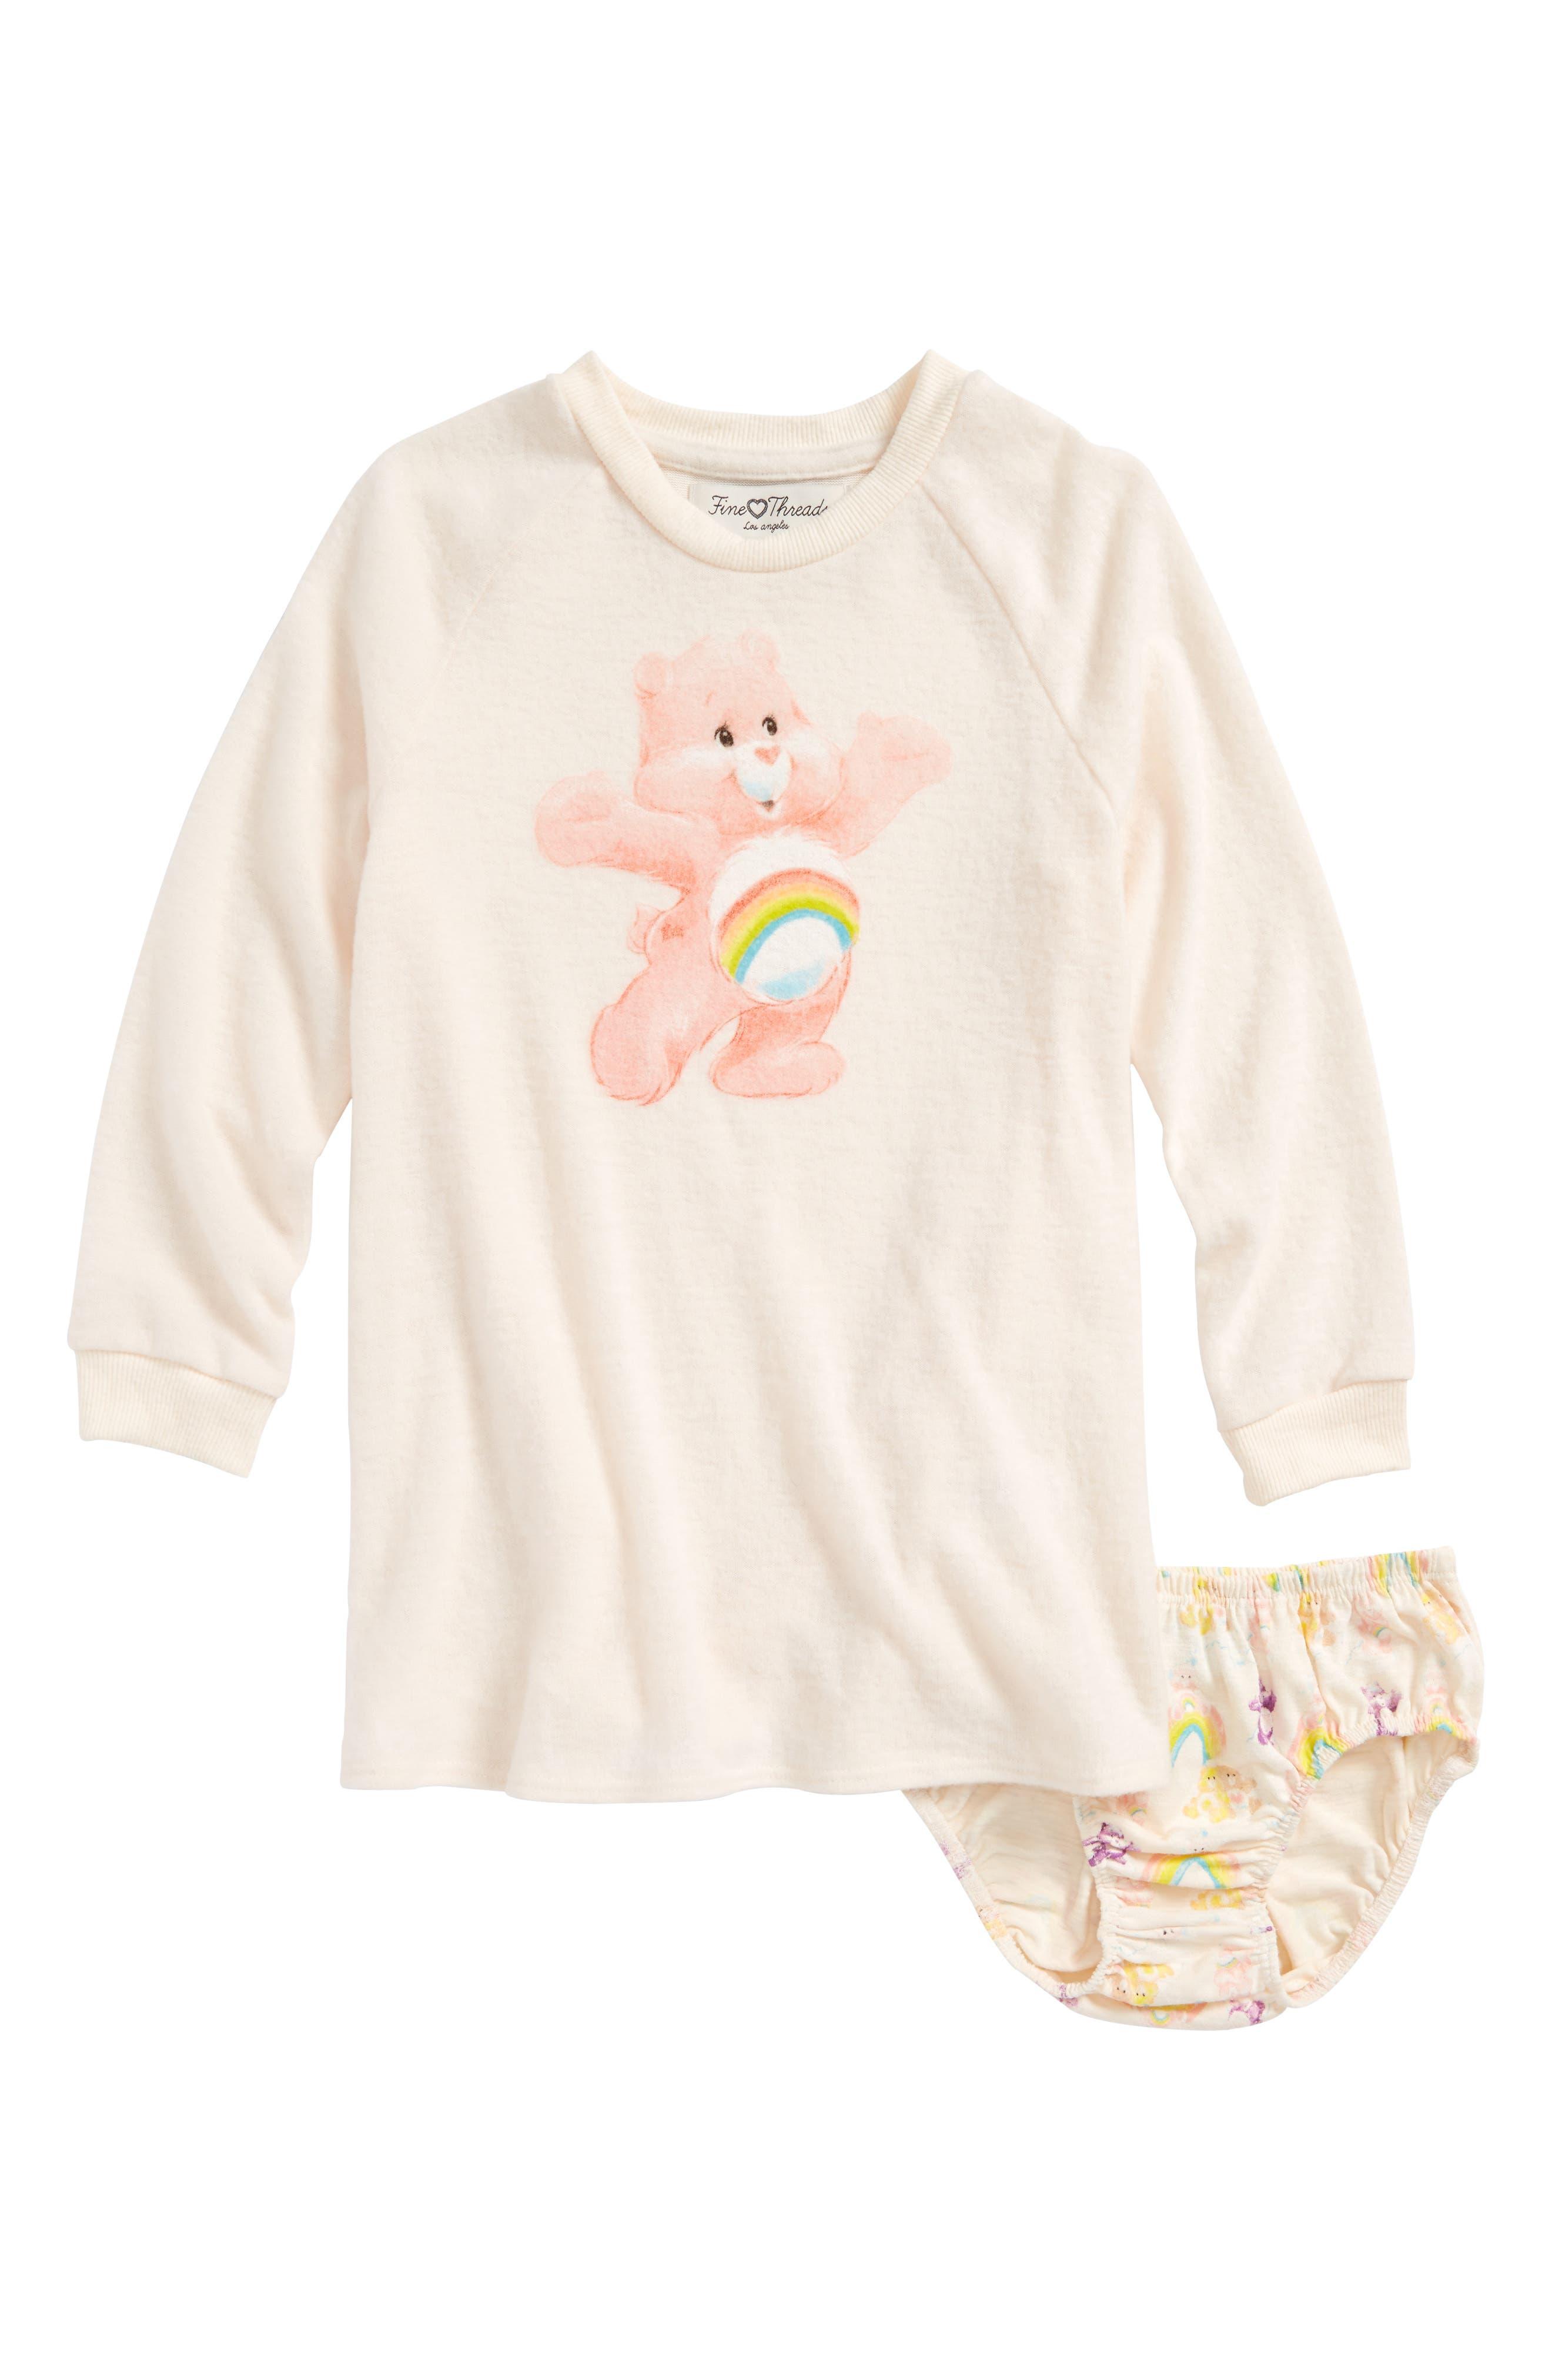 Care Bears<sup>™</sup> by Fine Threads Cheer Bear Dress,                             Main thumbnail 1, color,                             650